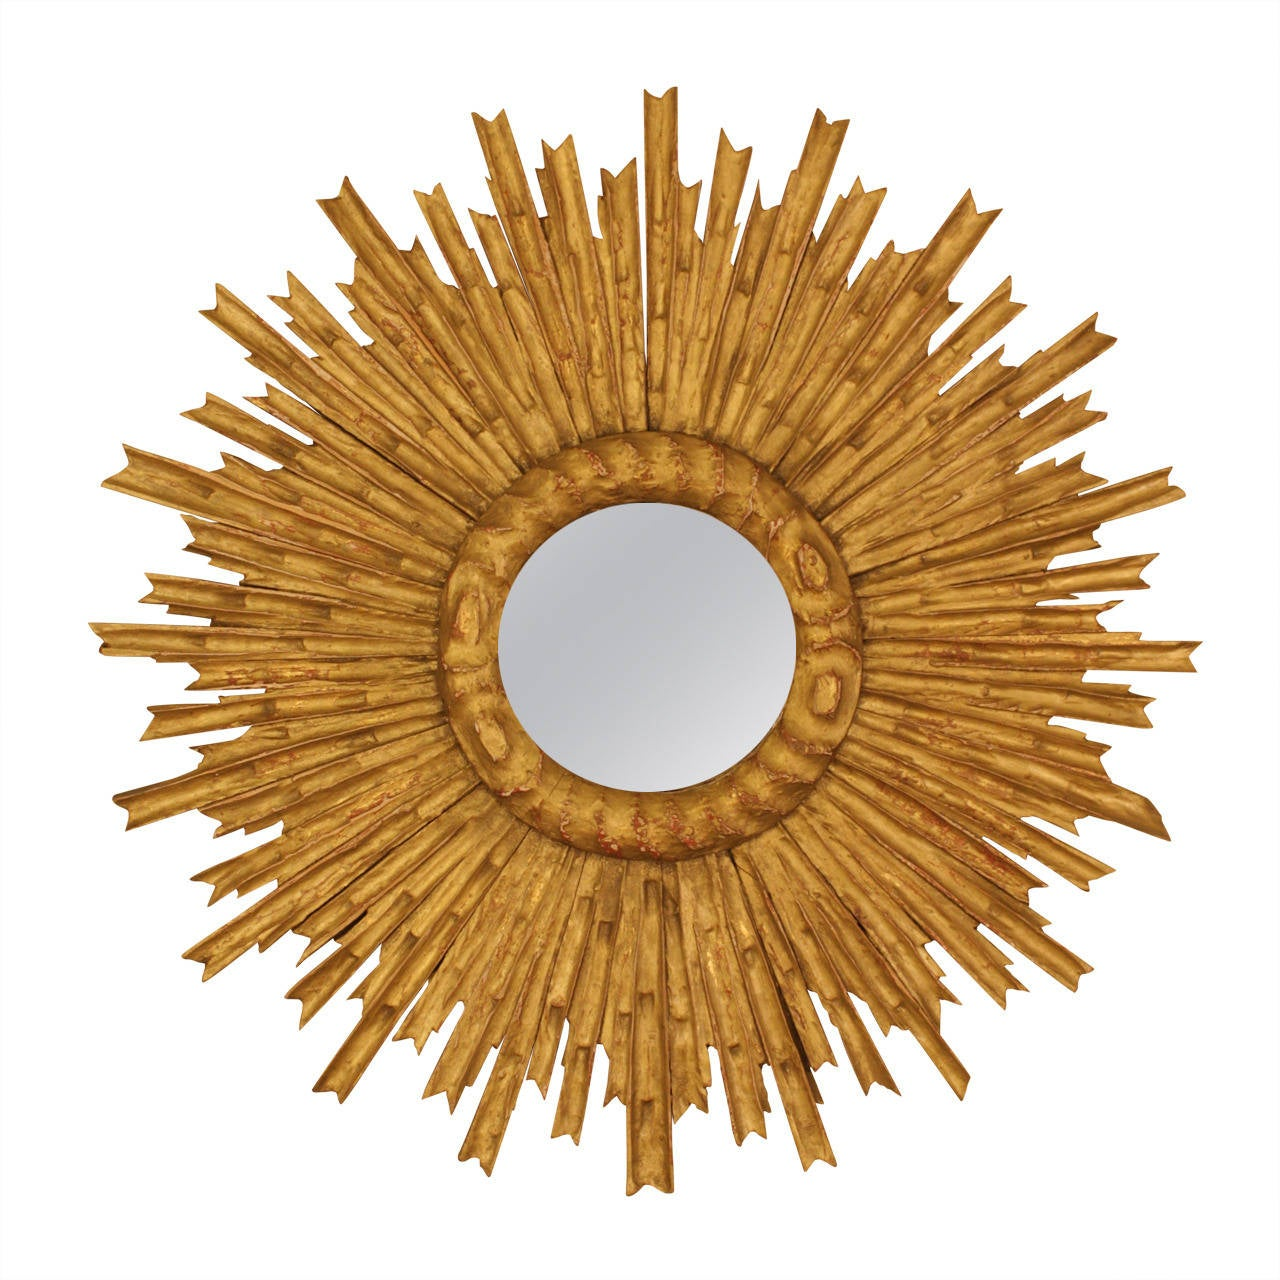 Spanish giltwood baroque style sunburst mirror at 1stdibs for Sunburst mirror